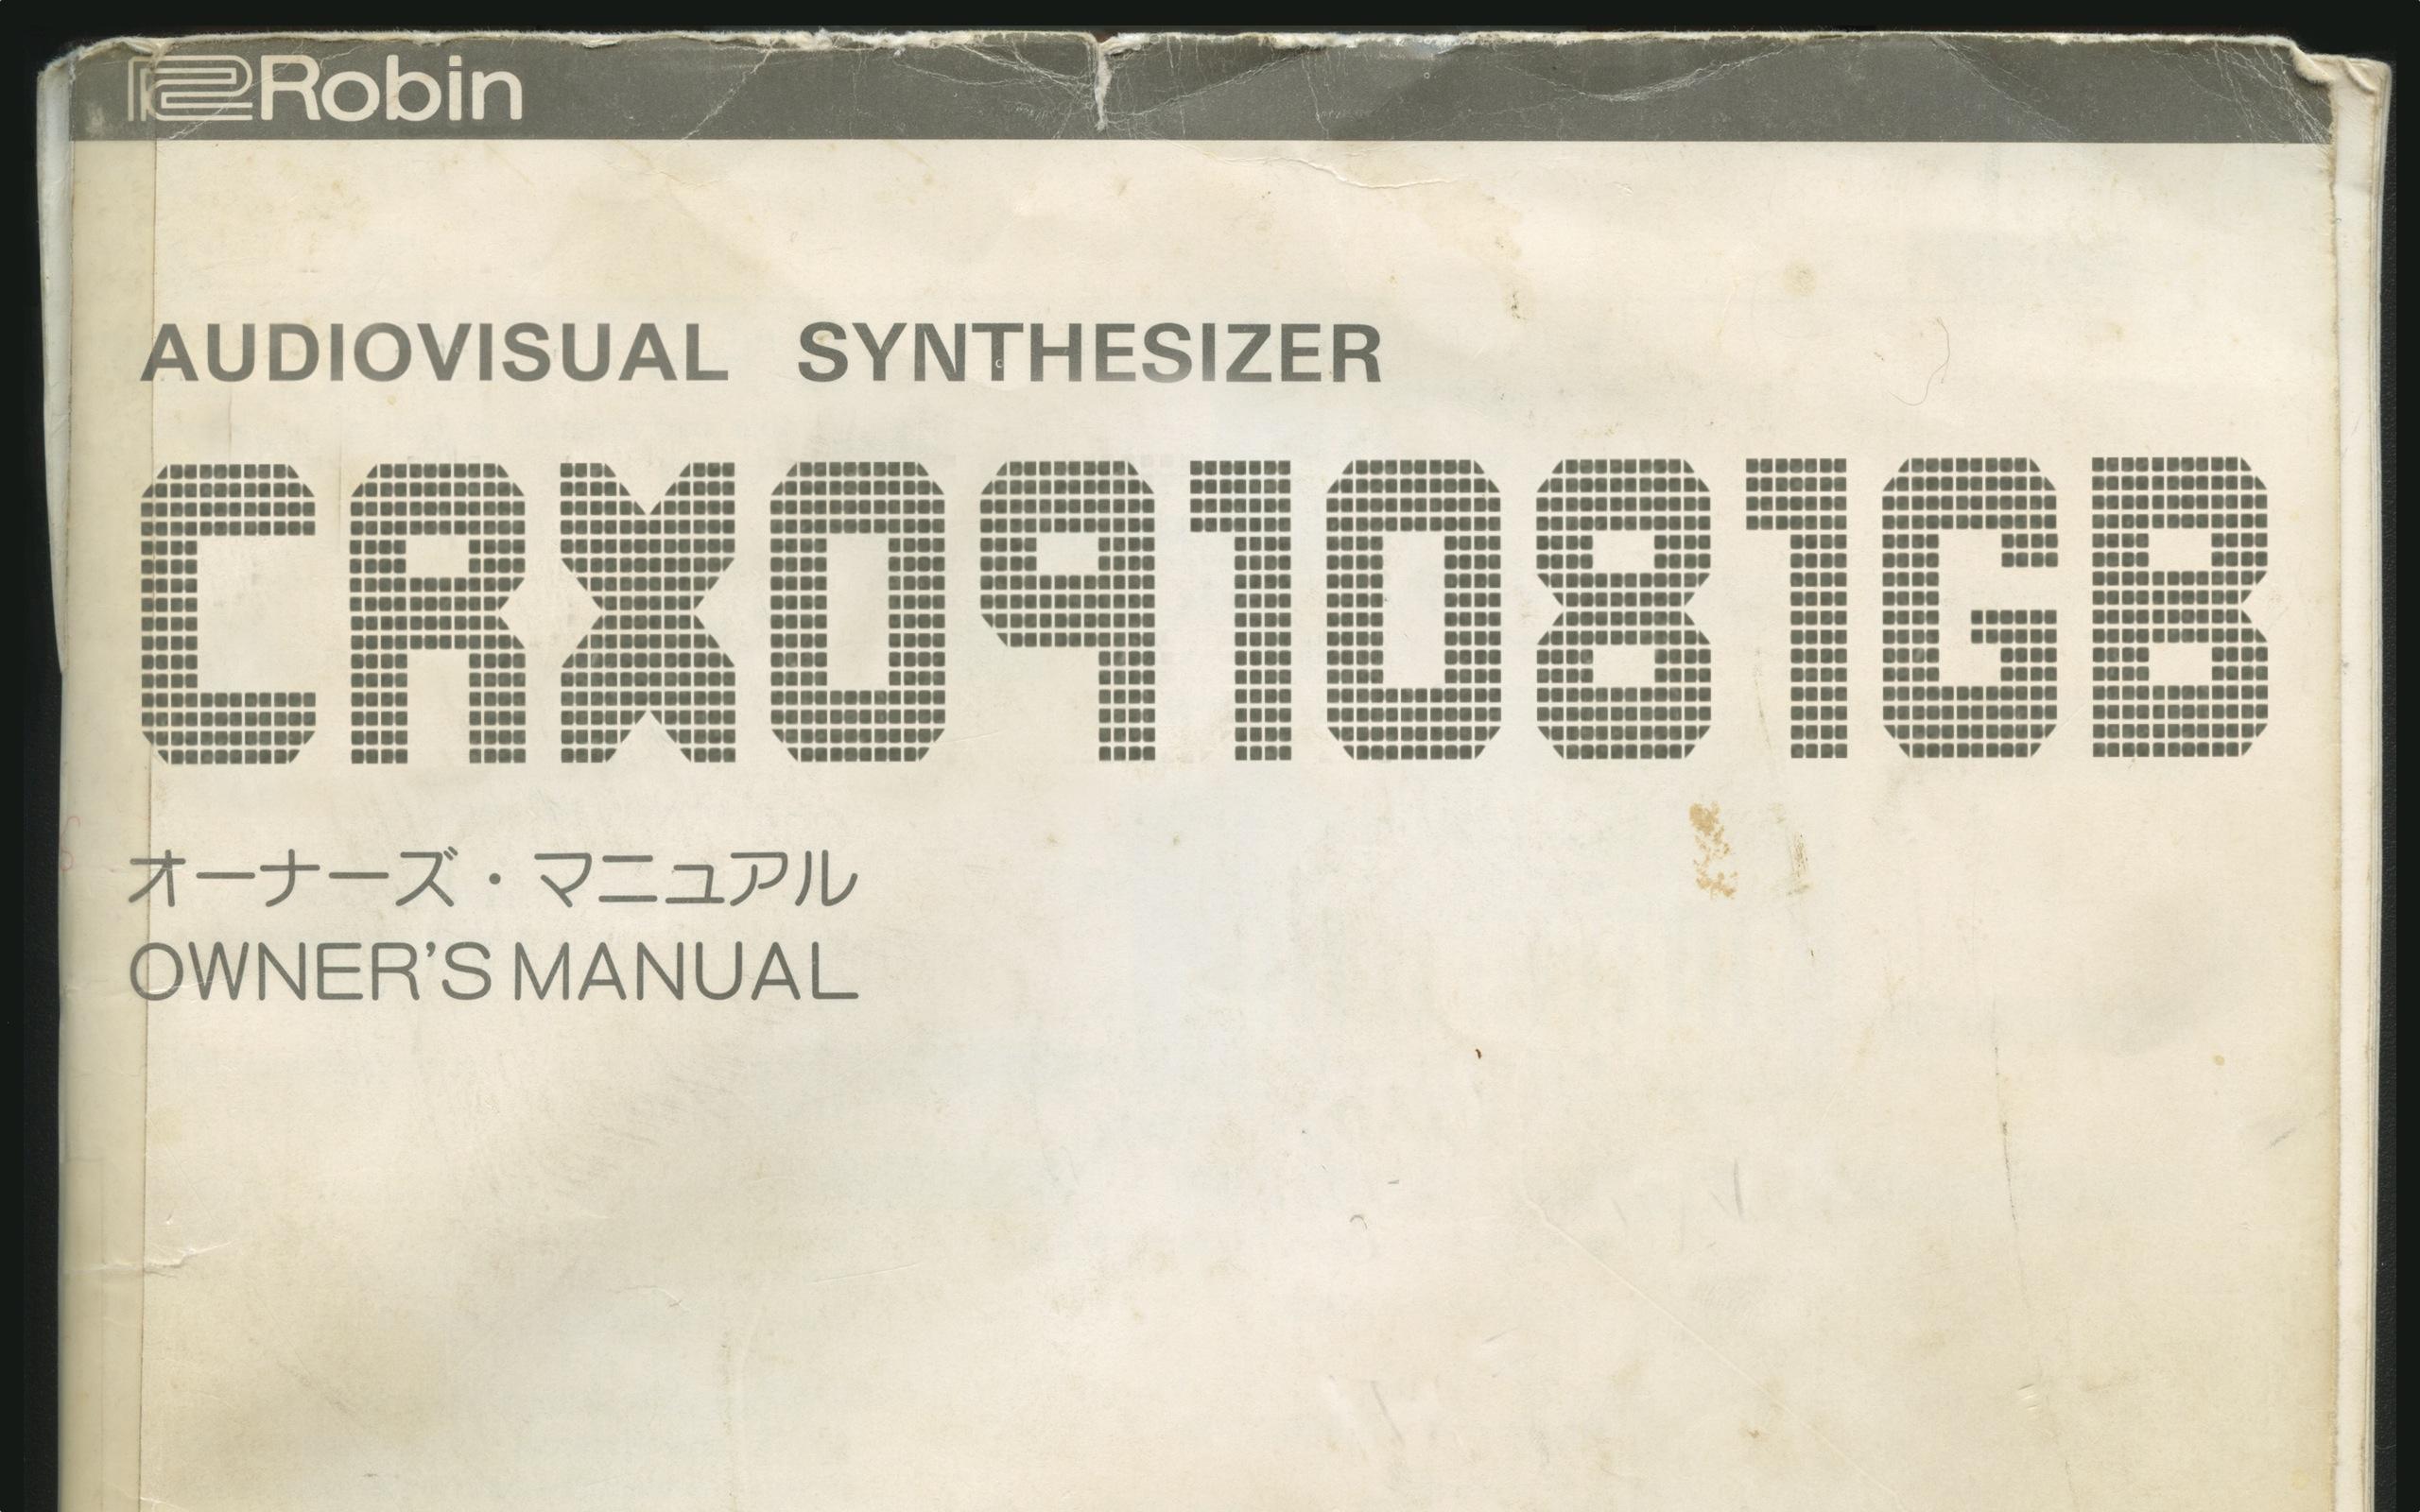 CRX091081GB Music Computer User Manual